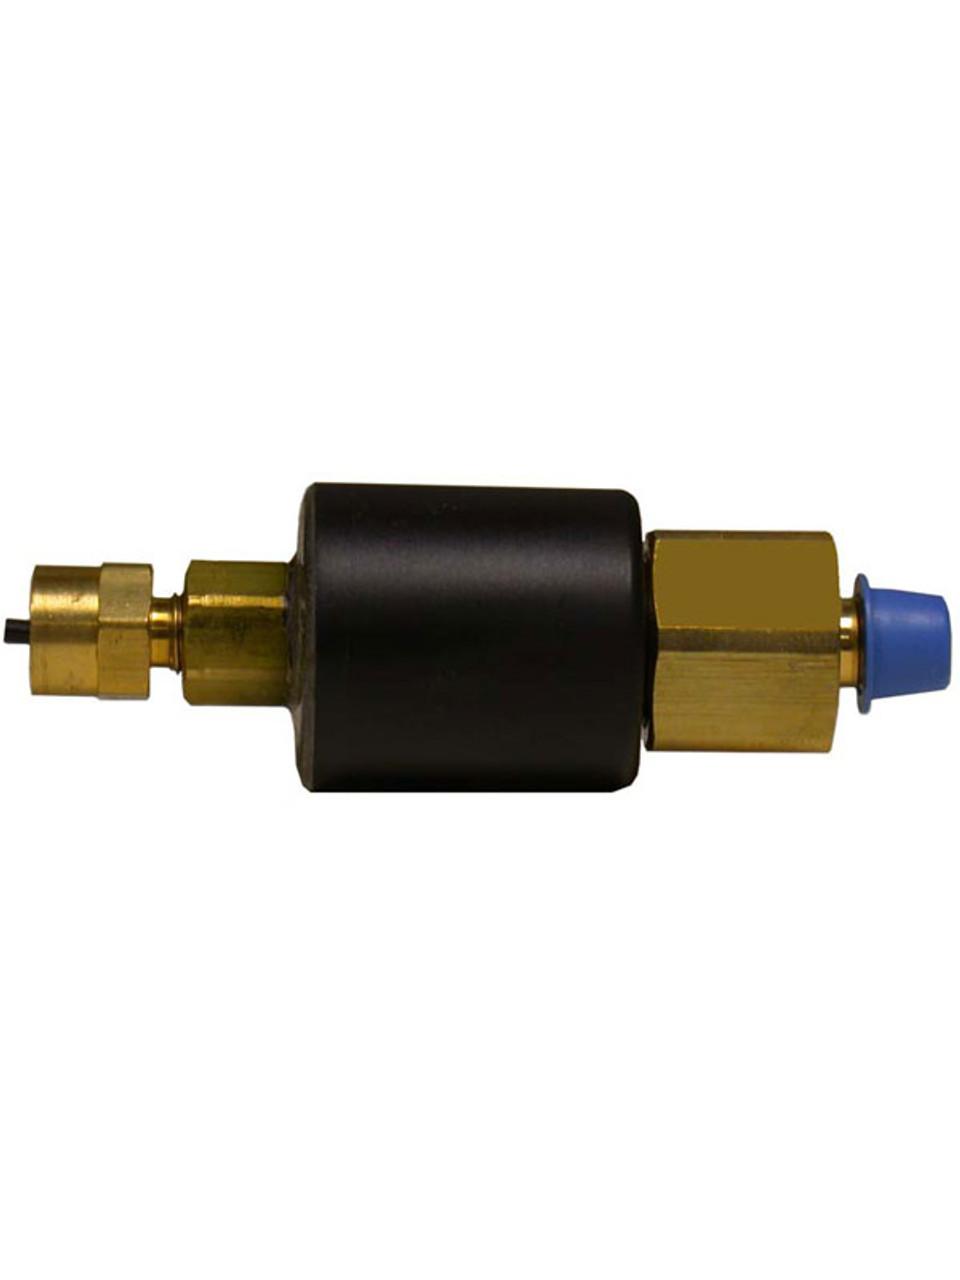 RLBS --- Reverse Lockout Brake Solenoid